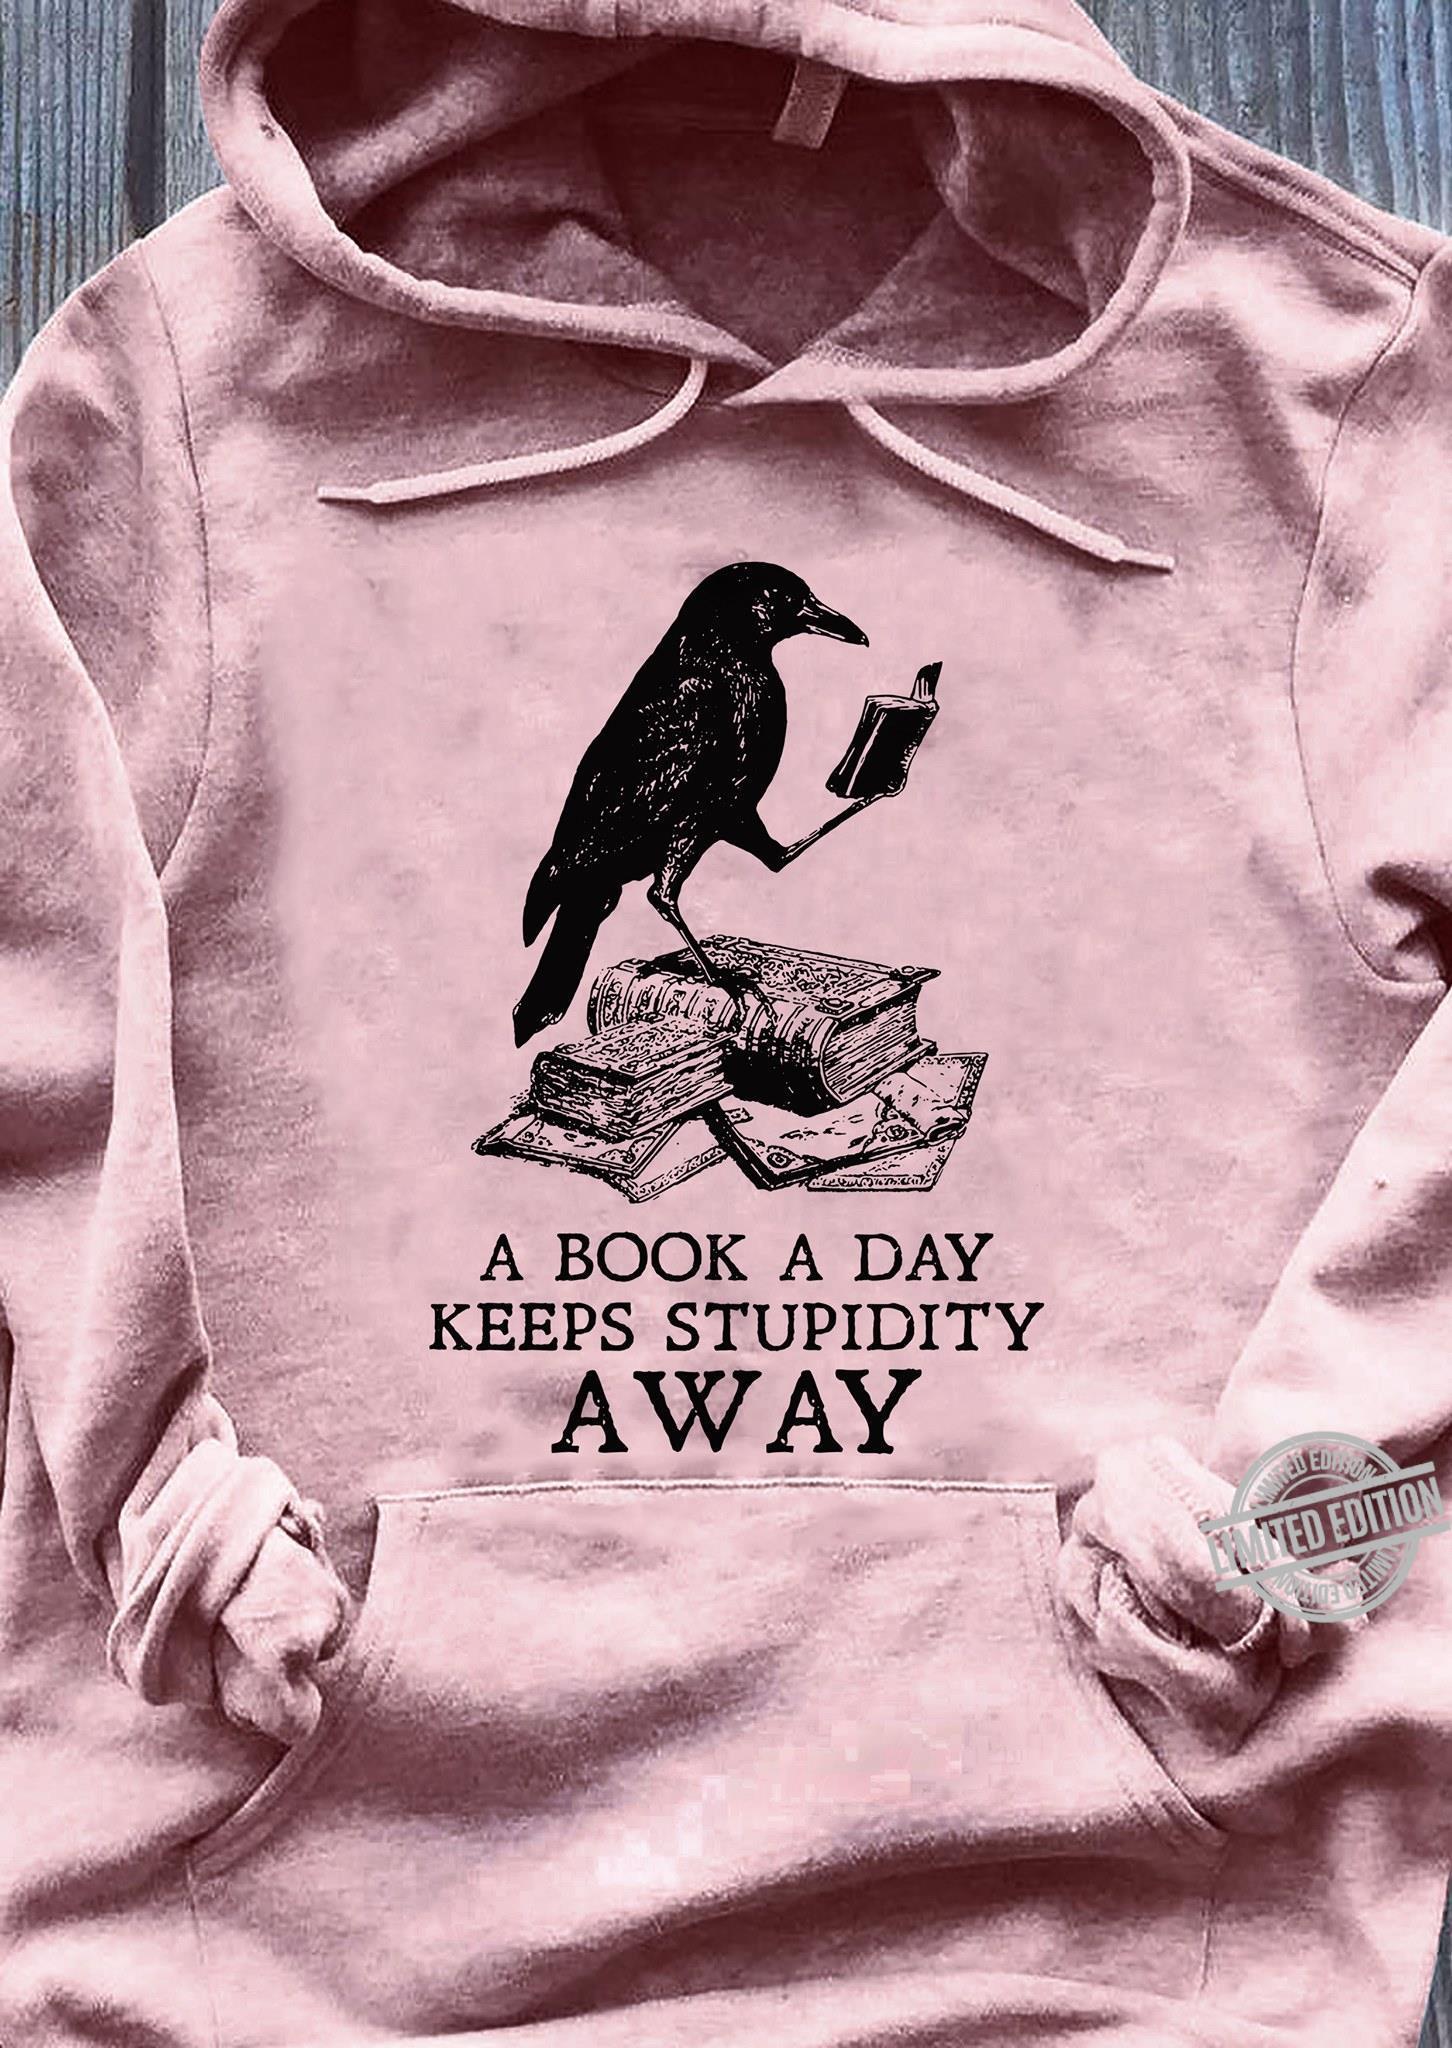 A Book A Day Keeps Stupidity Away Shirt